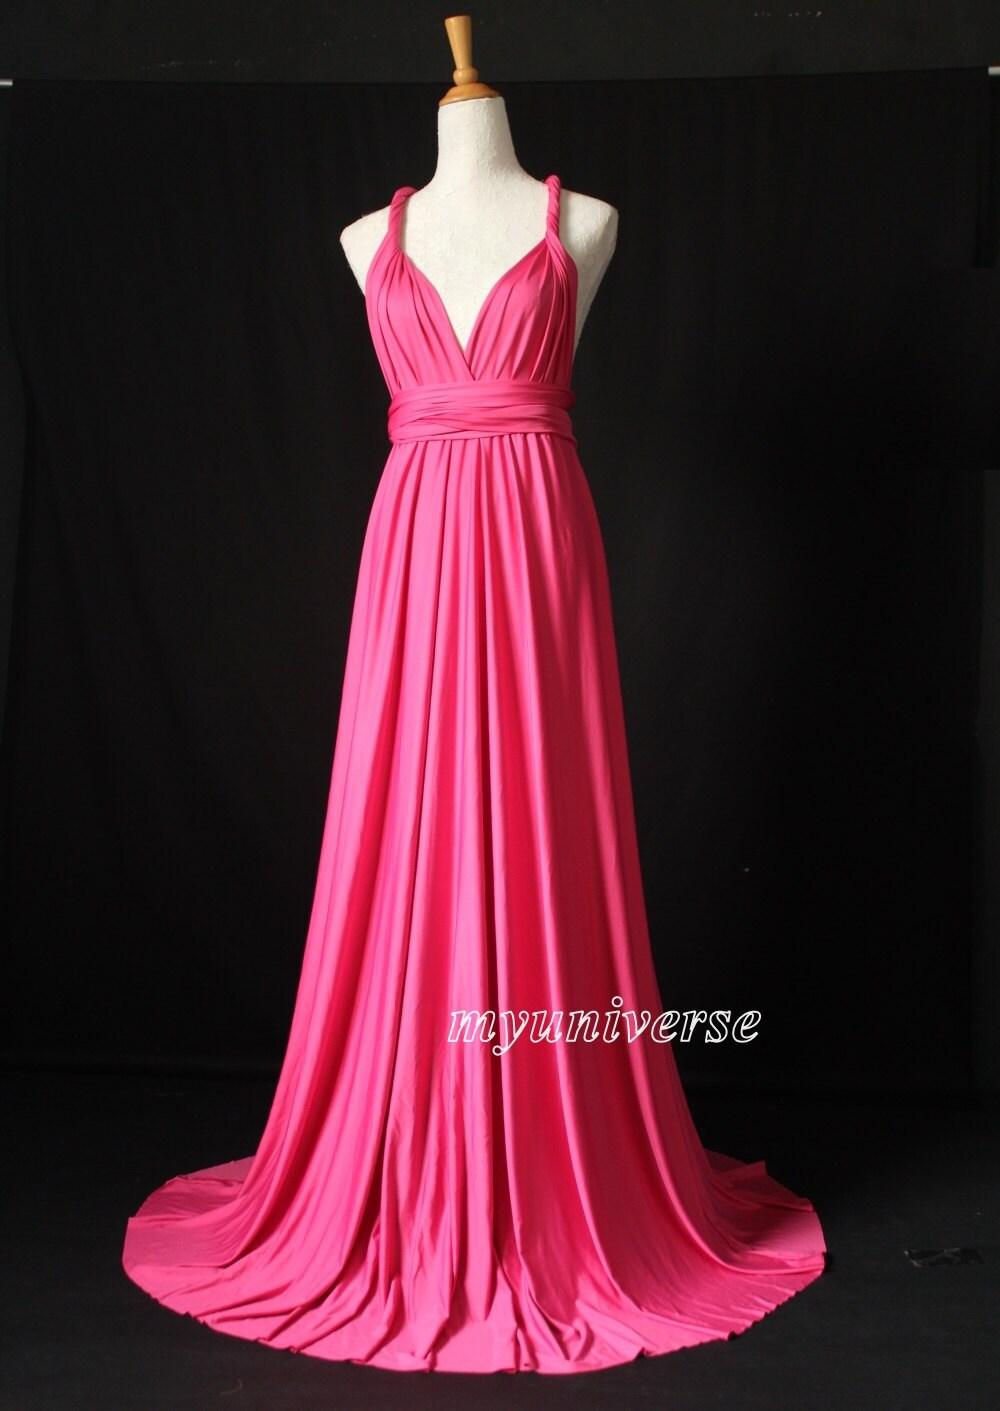 Rose Pink Infinity Dress Wrap Convertible Dress Bridesmaid